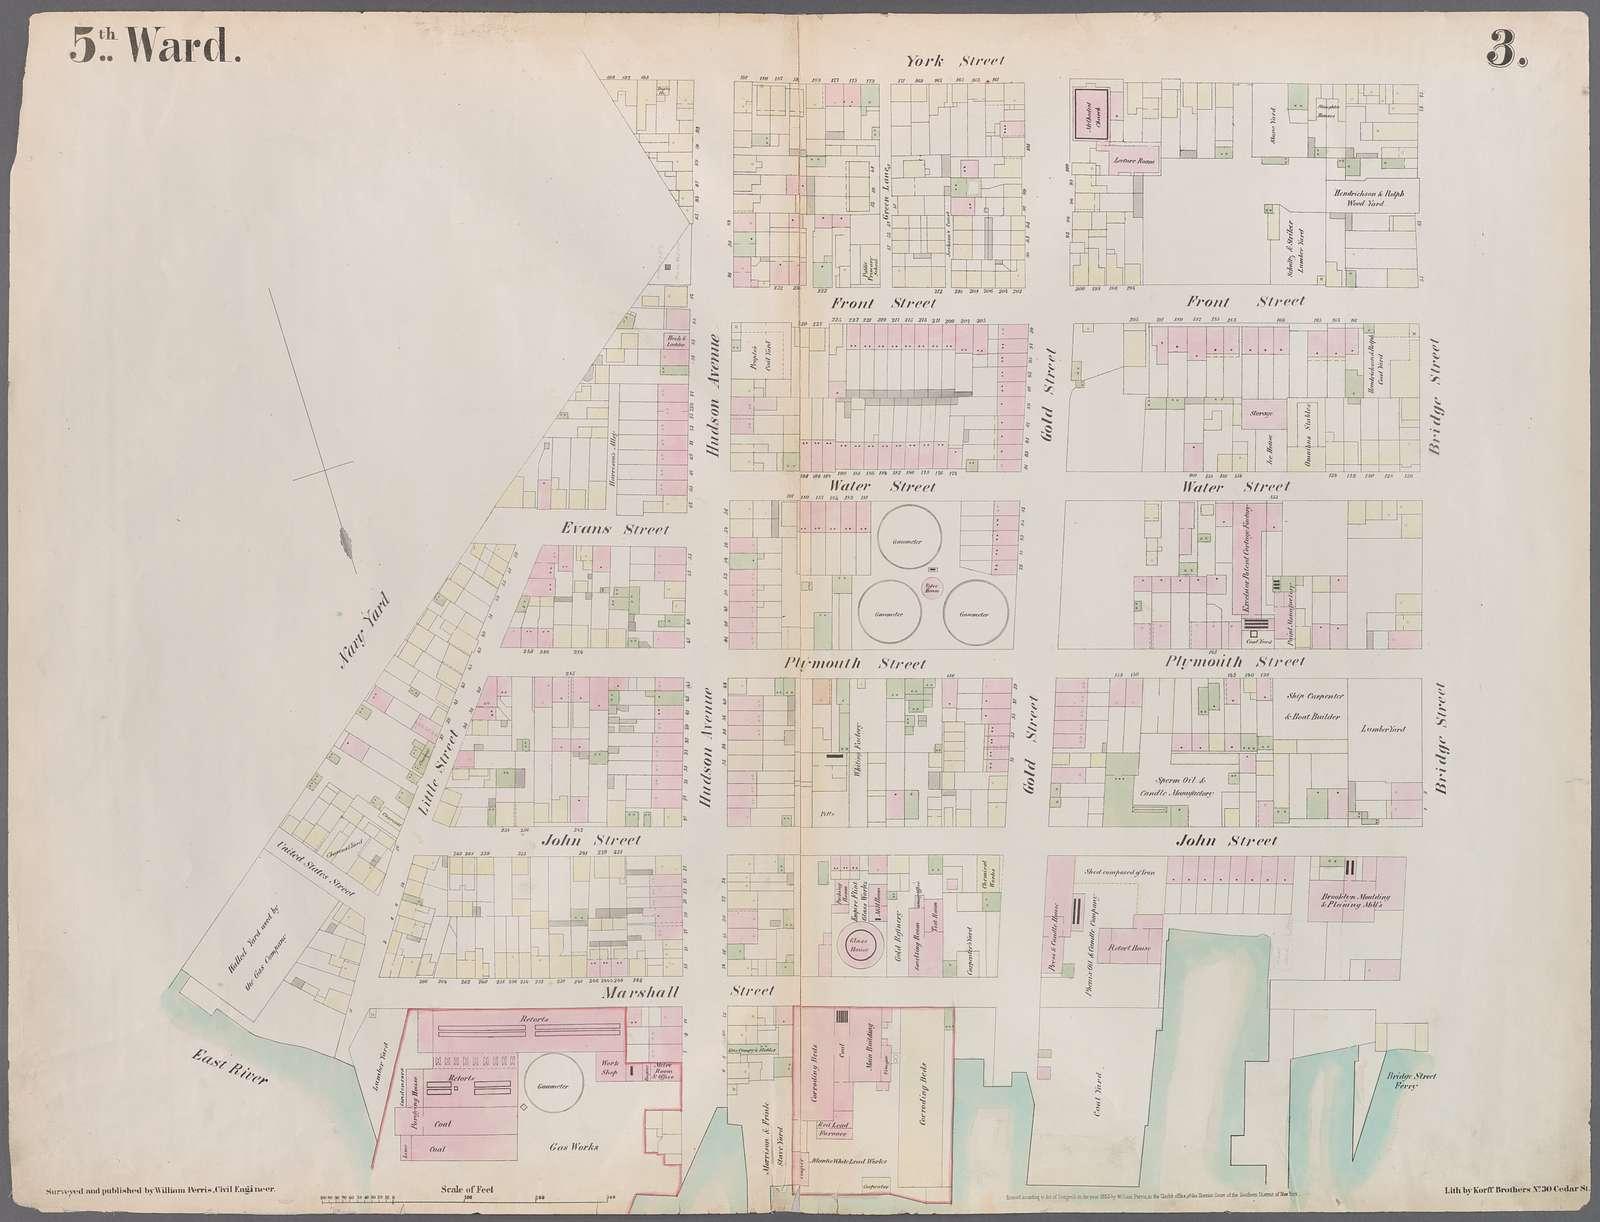 [Plate 3: Map bounded by East River, Brooklyn Navy Yard, York Street, Bridge Street.]